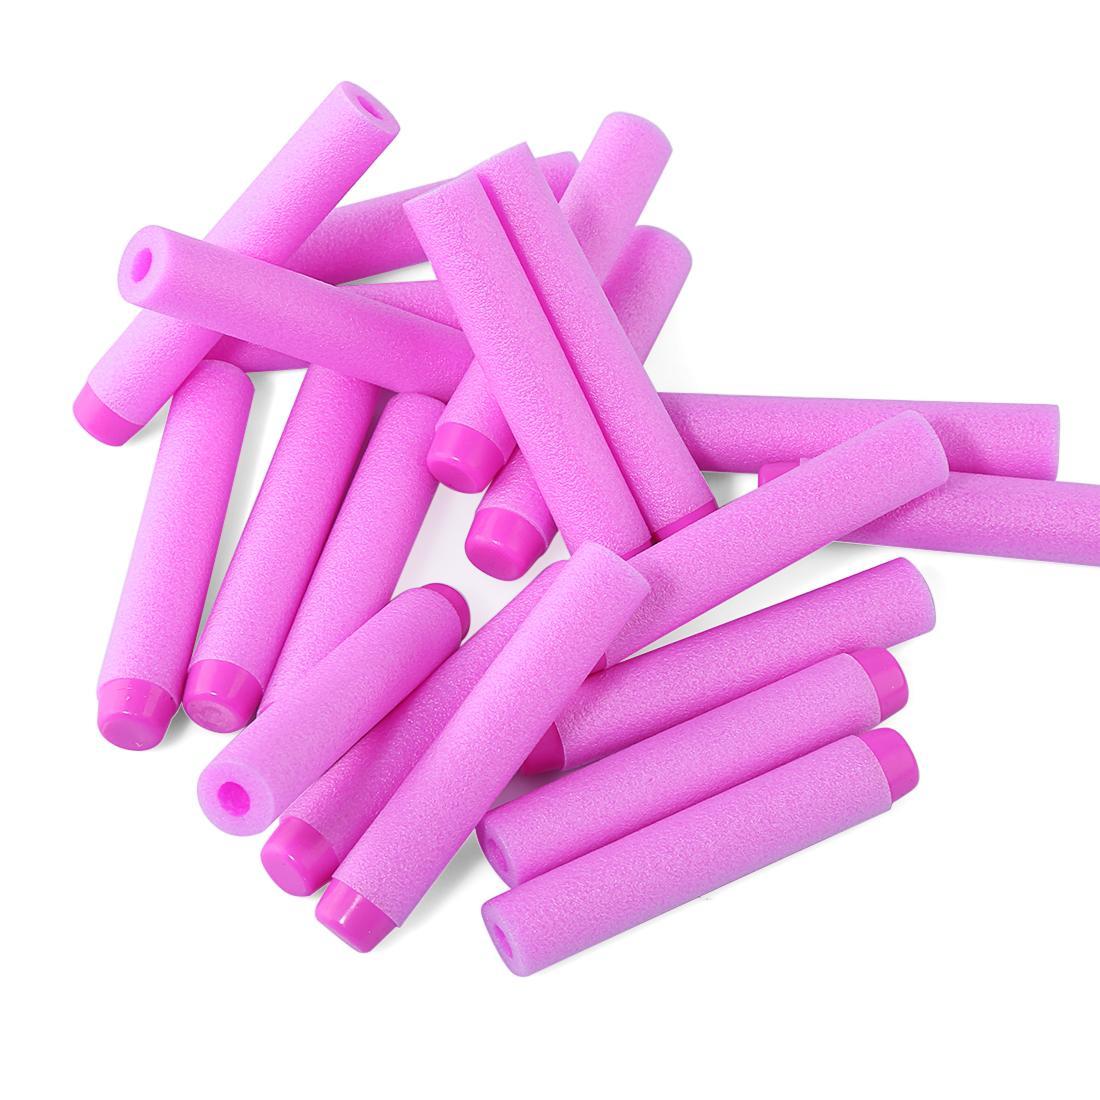 NFSTRIKE 300pcs Soft Bullet Women <font><b>Girls</b></font> Foam <font><b>Nerf</b></font> Toy <font><b>Gun</b></font> Free Shipping